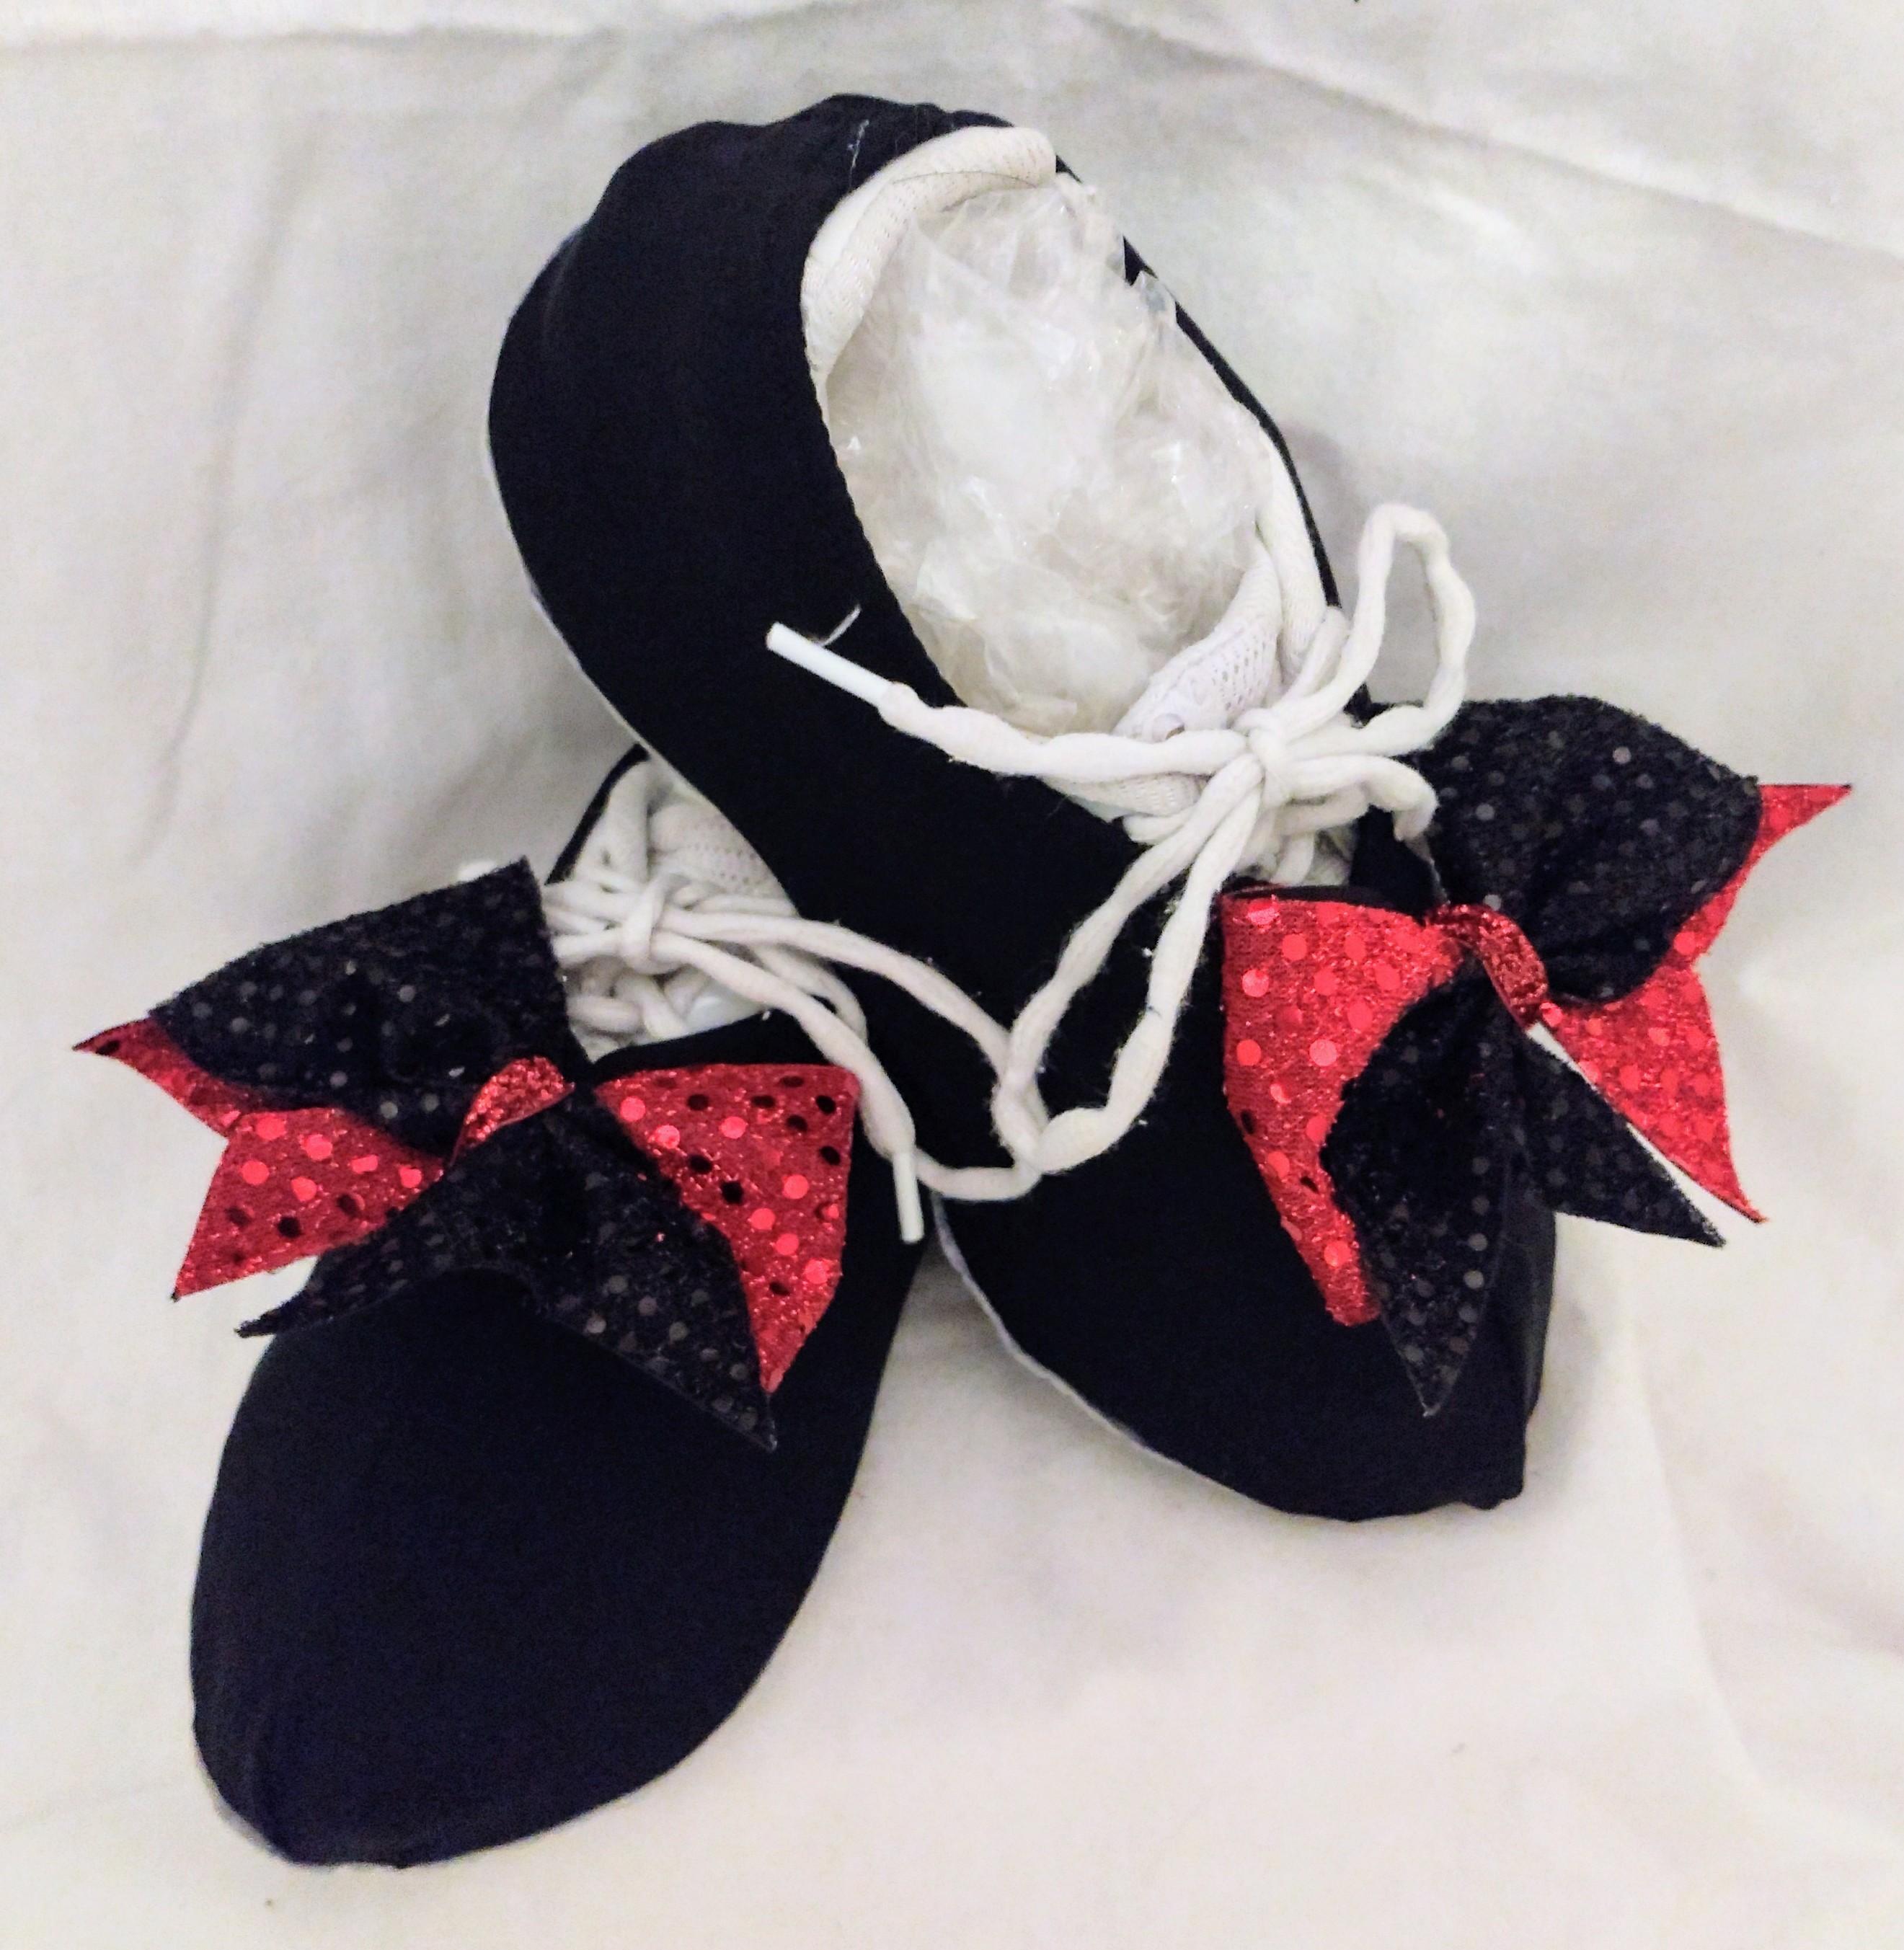 Basic Black Shouter Wear Cheer Shoe Covers